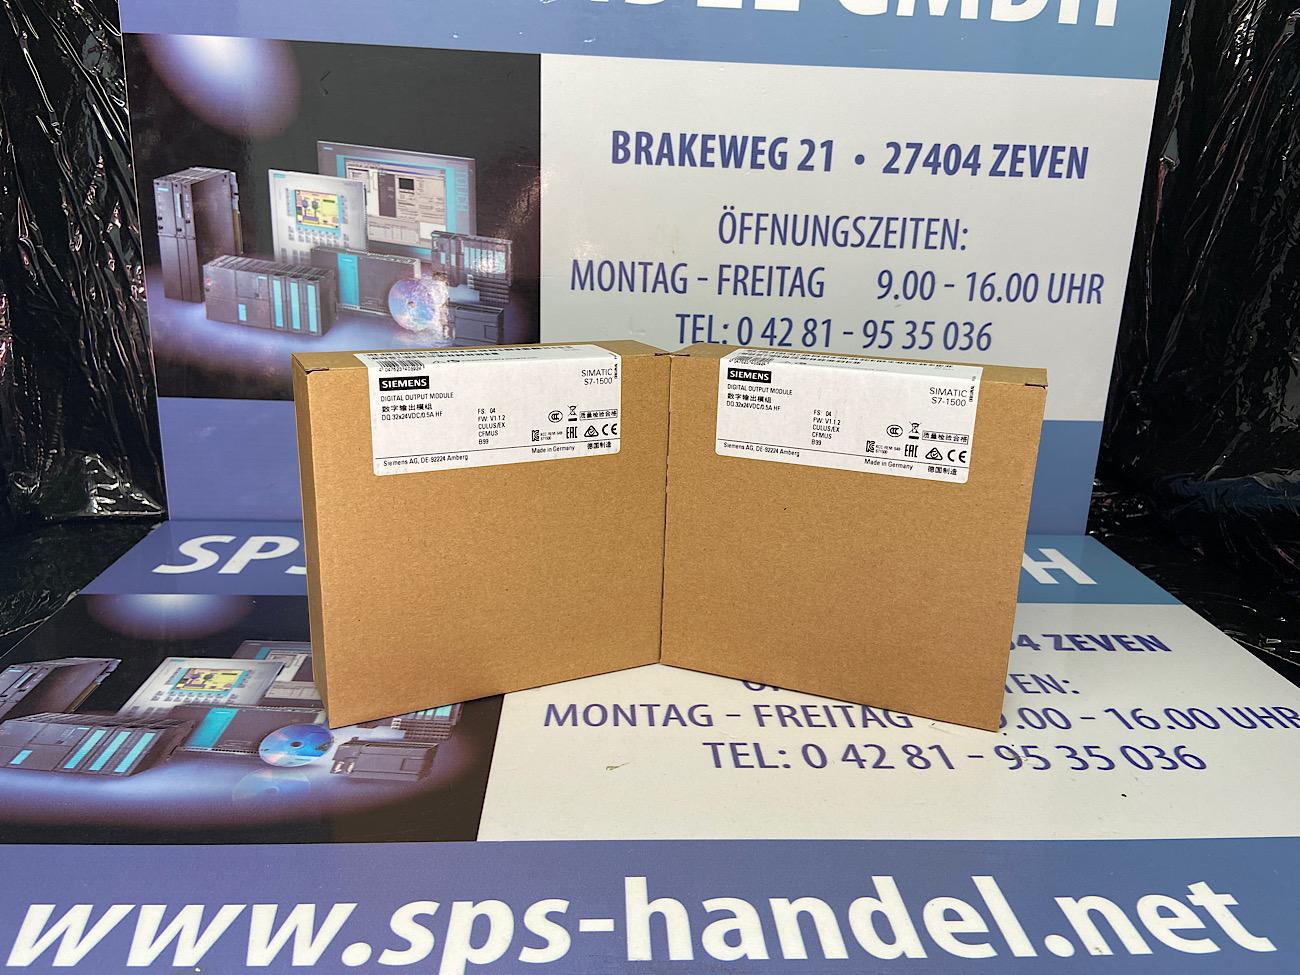 6ES7522-1BL01-0AB0   S7-1500 DO32   Neu Siegel 26%